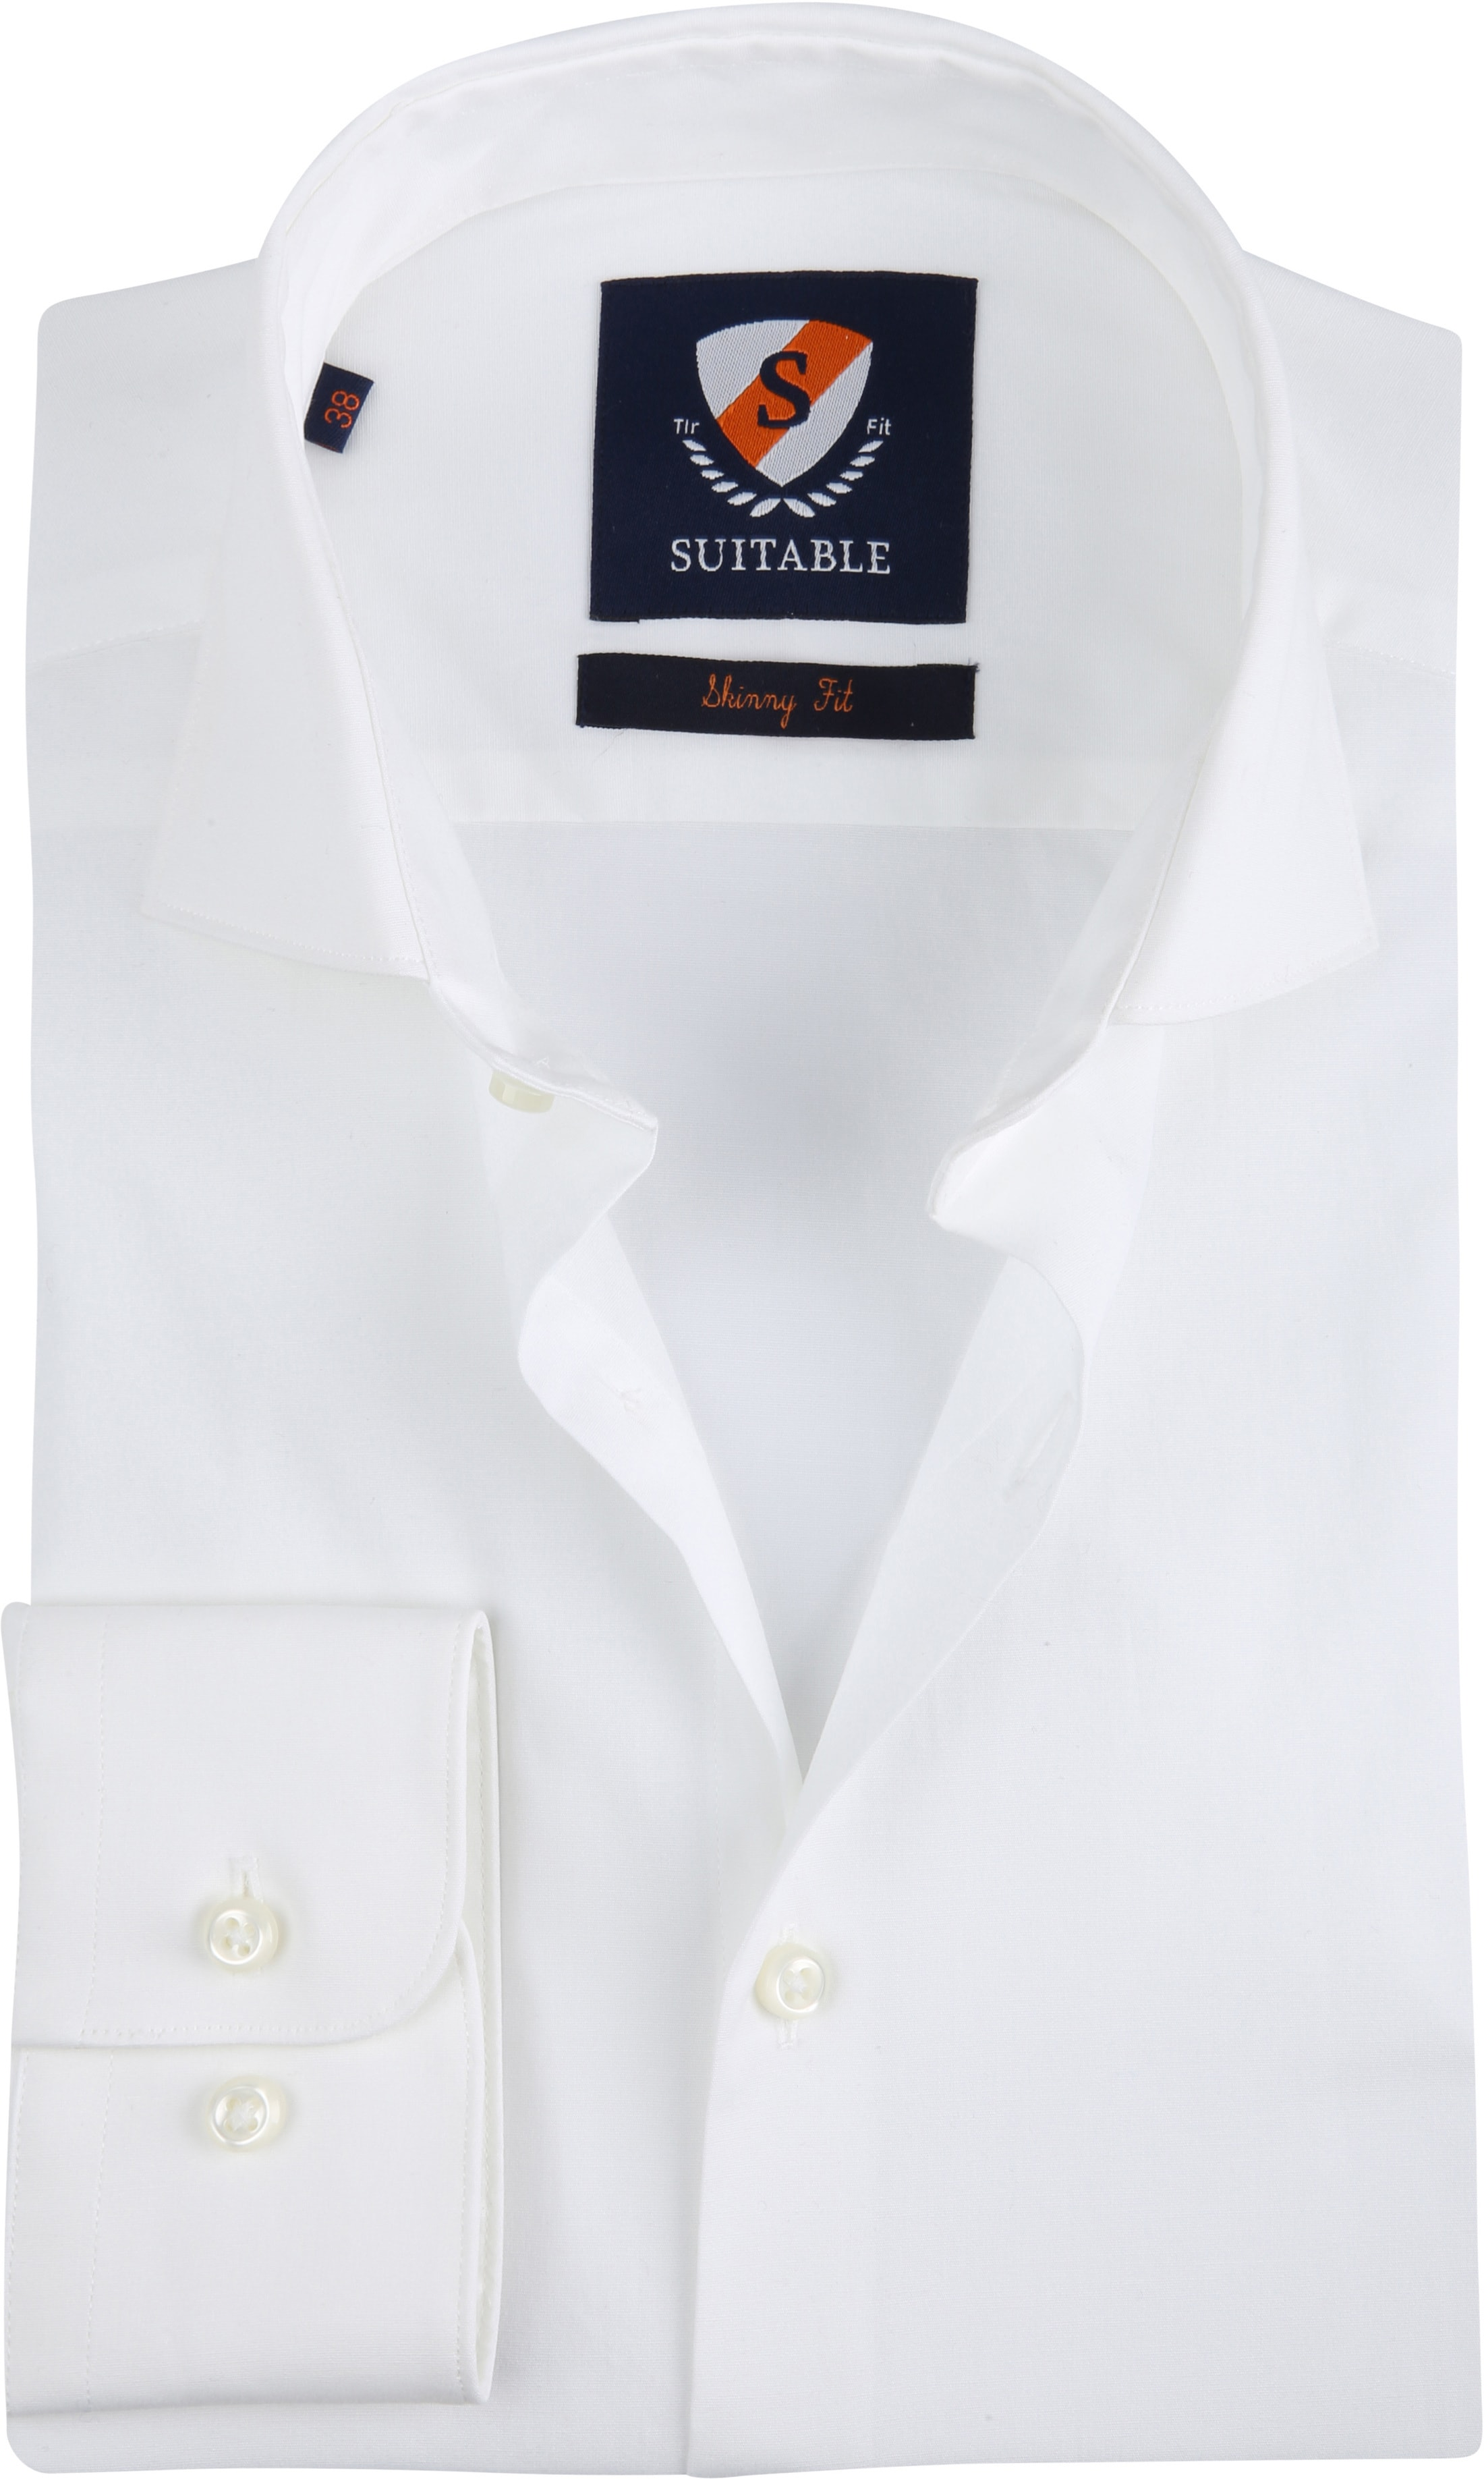 Overhemd Wit Slim Fit.Suitable Overhemd Skinny Fit Wit Spe18306we60 Online Bestellen